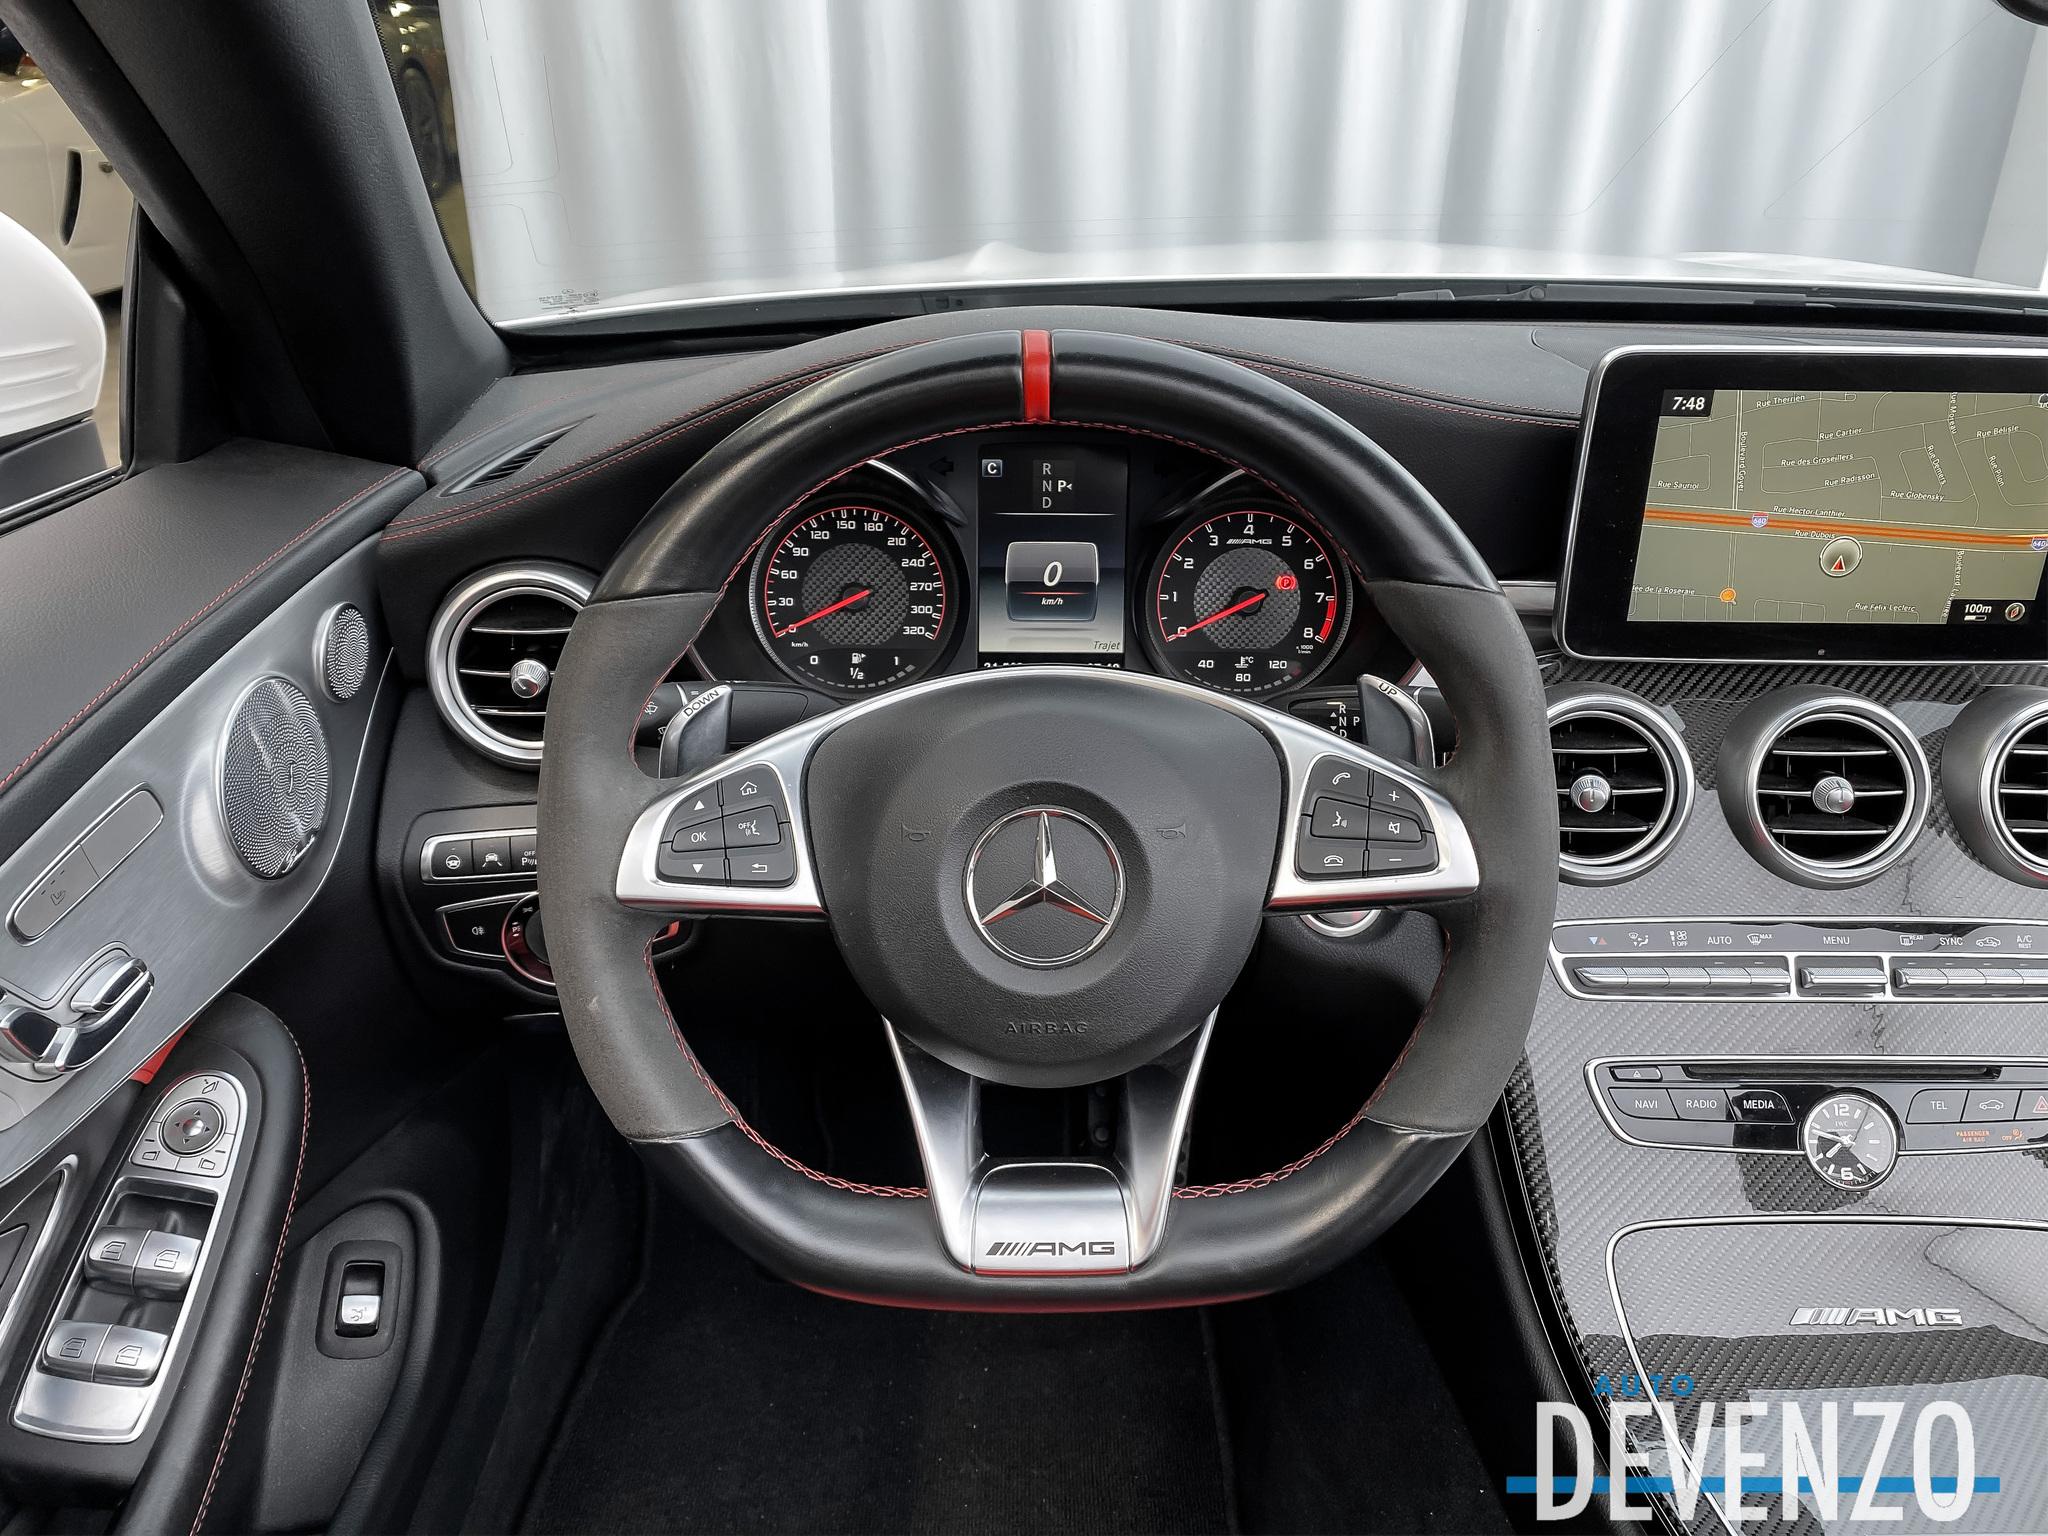 2017 Mercedes-Benz C-Class AMG C63 S Cabriolet V8 BITURBO 503HP complet